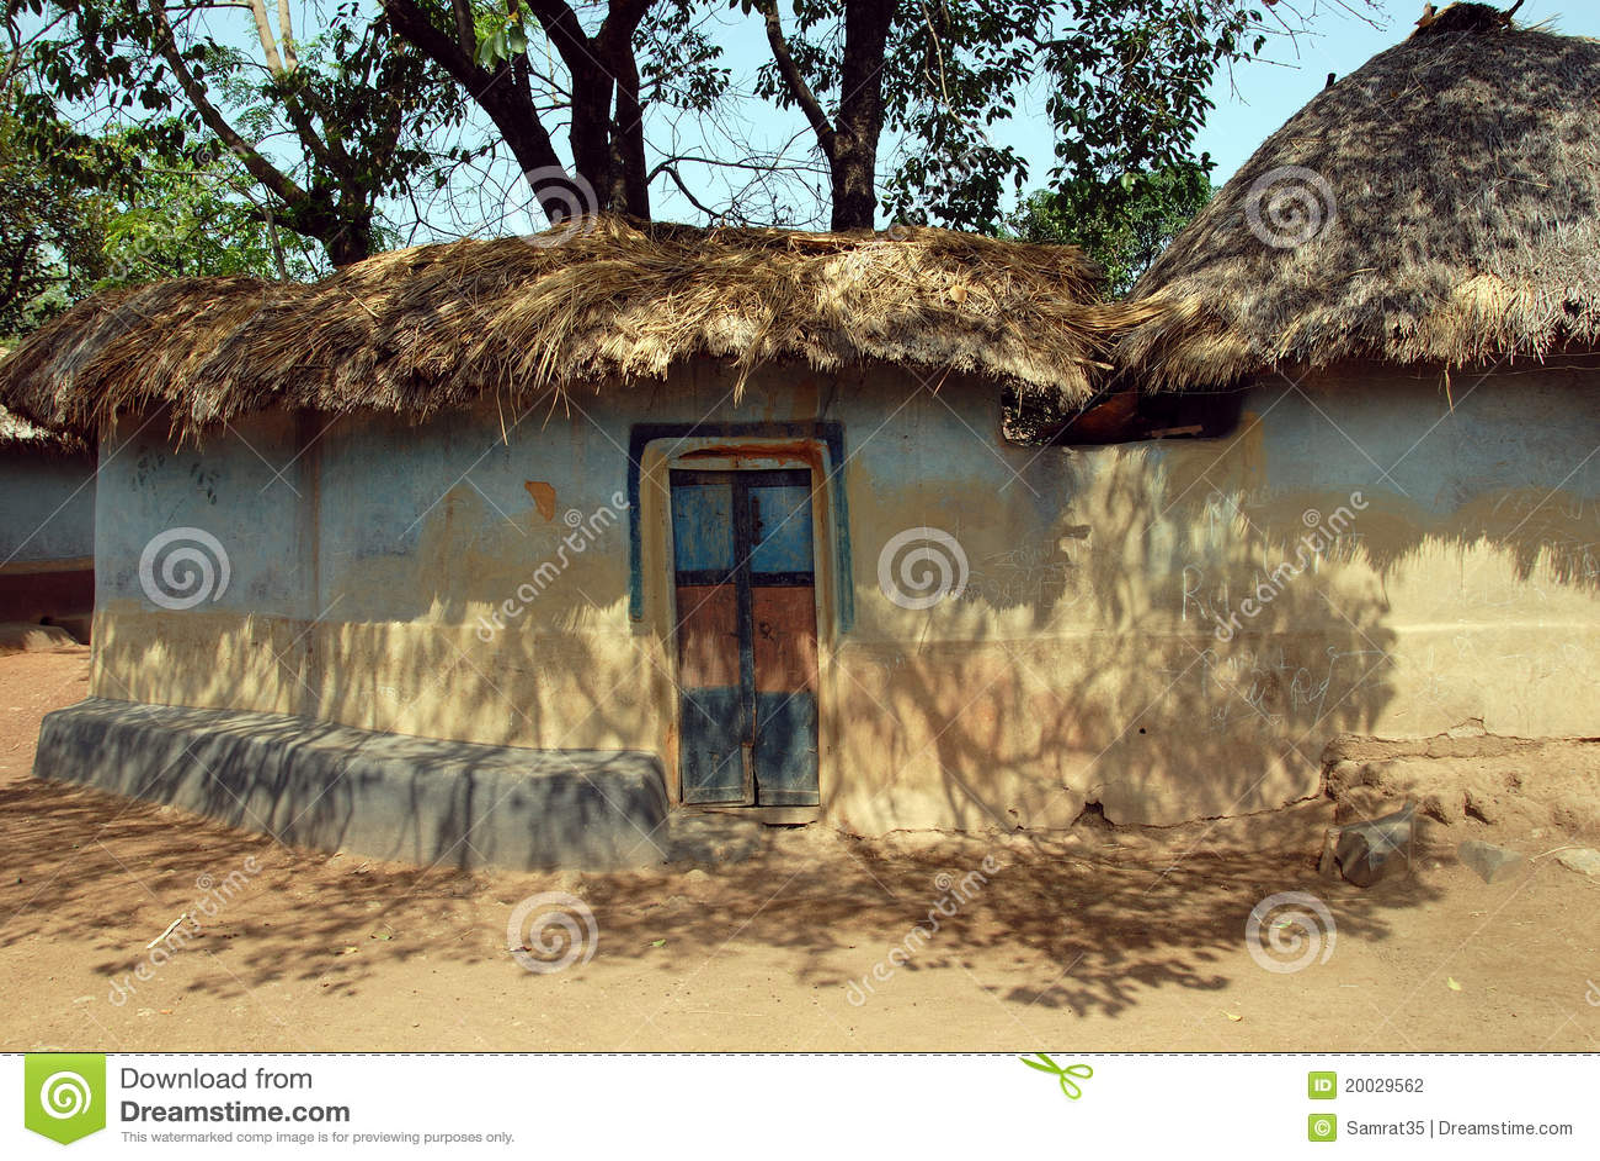 Indian Village Life June 222011 SantiniketanBirbhumWest BengalIndia